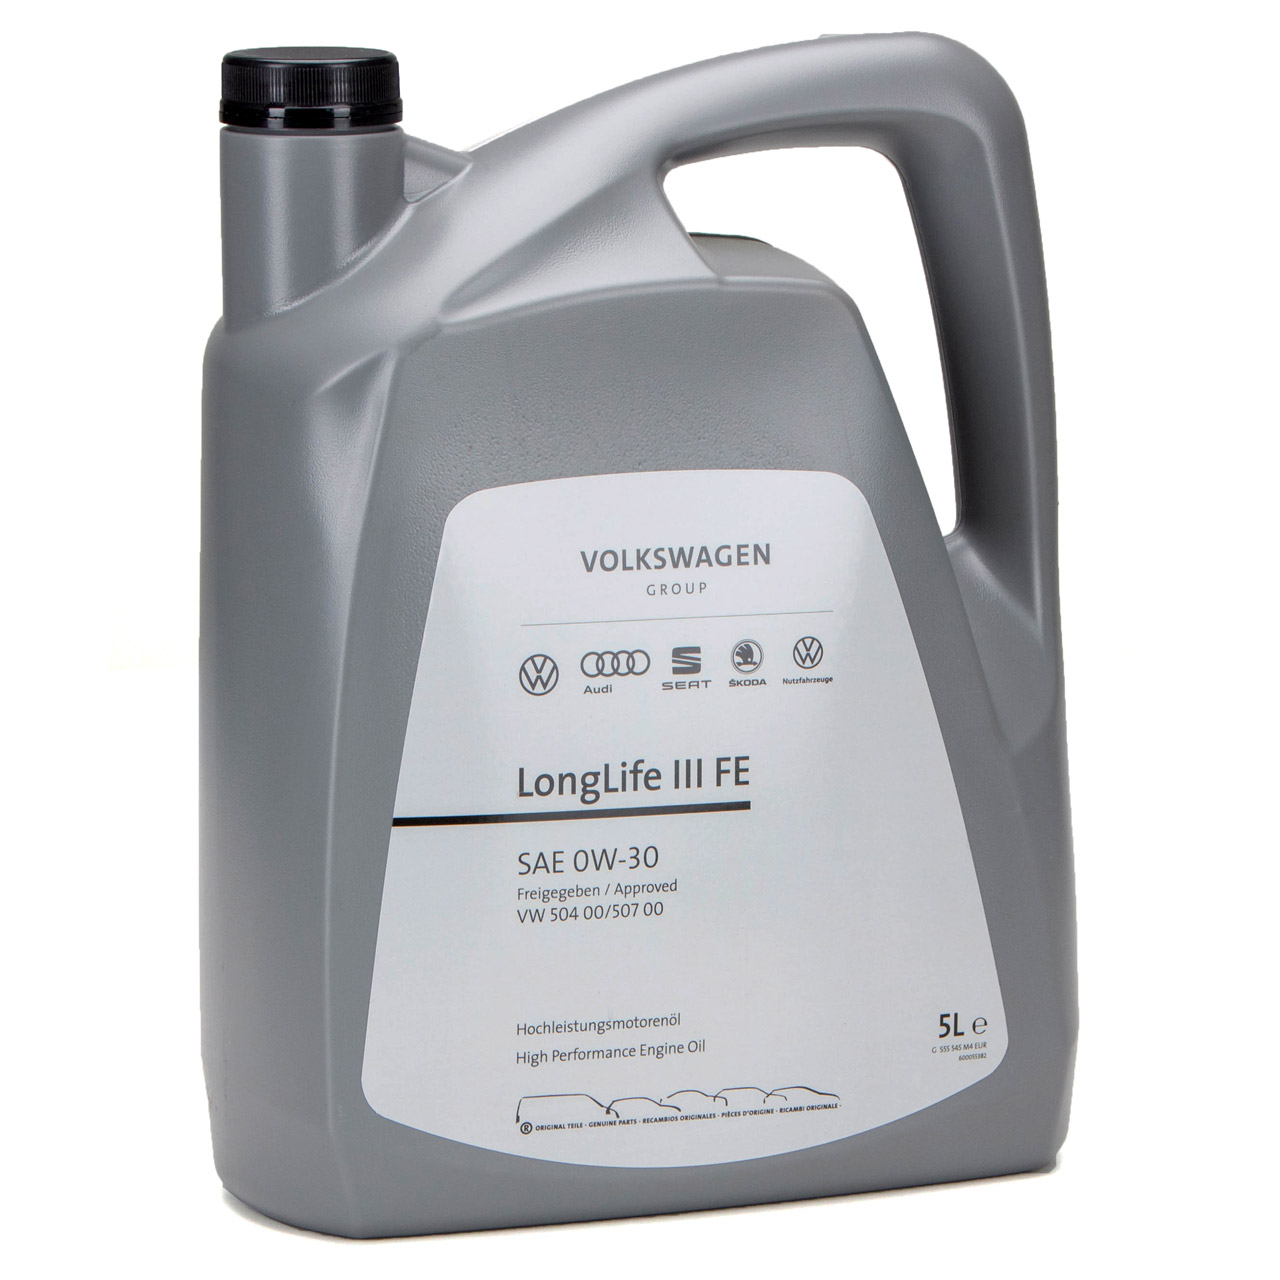 ORIGINAL VW Motoröl Öl 0W30 LONGLIFE III FE 504.00 507.00 GS55545M4 - 5 Liter